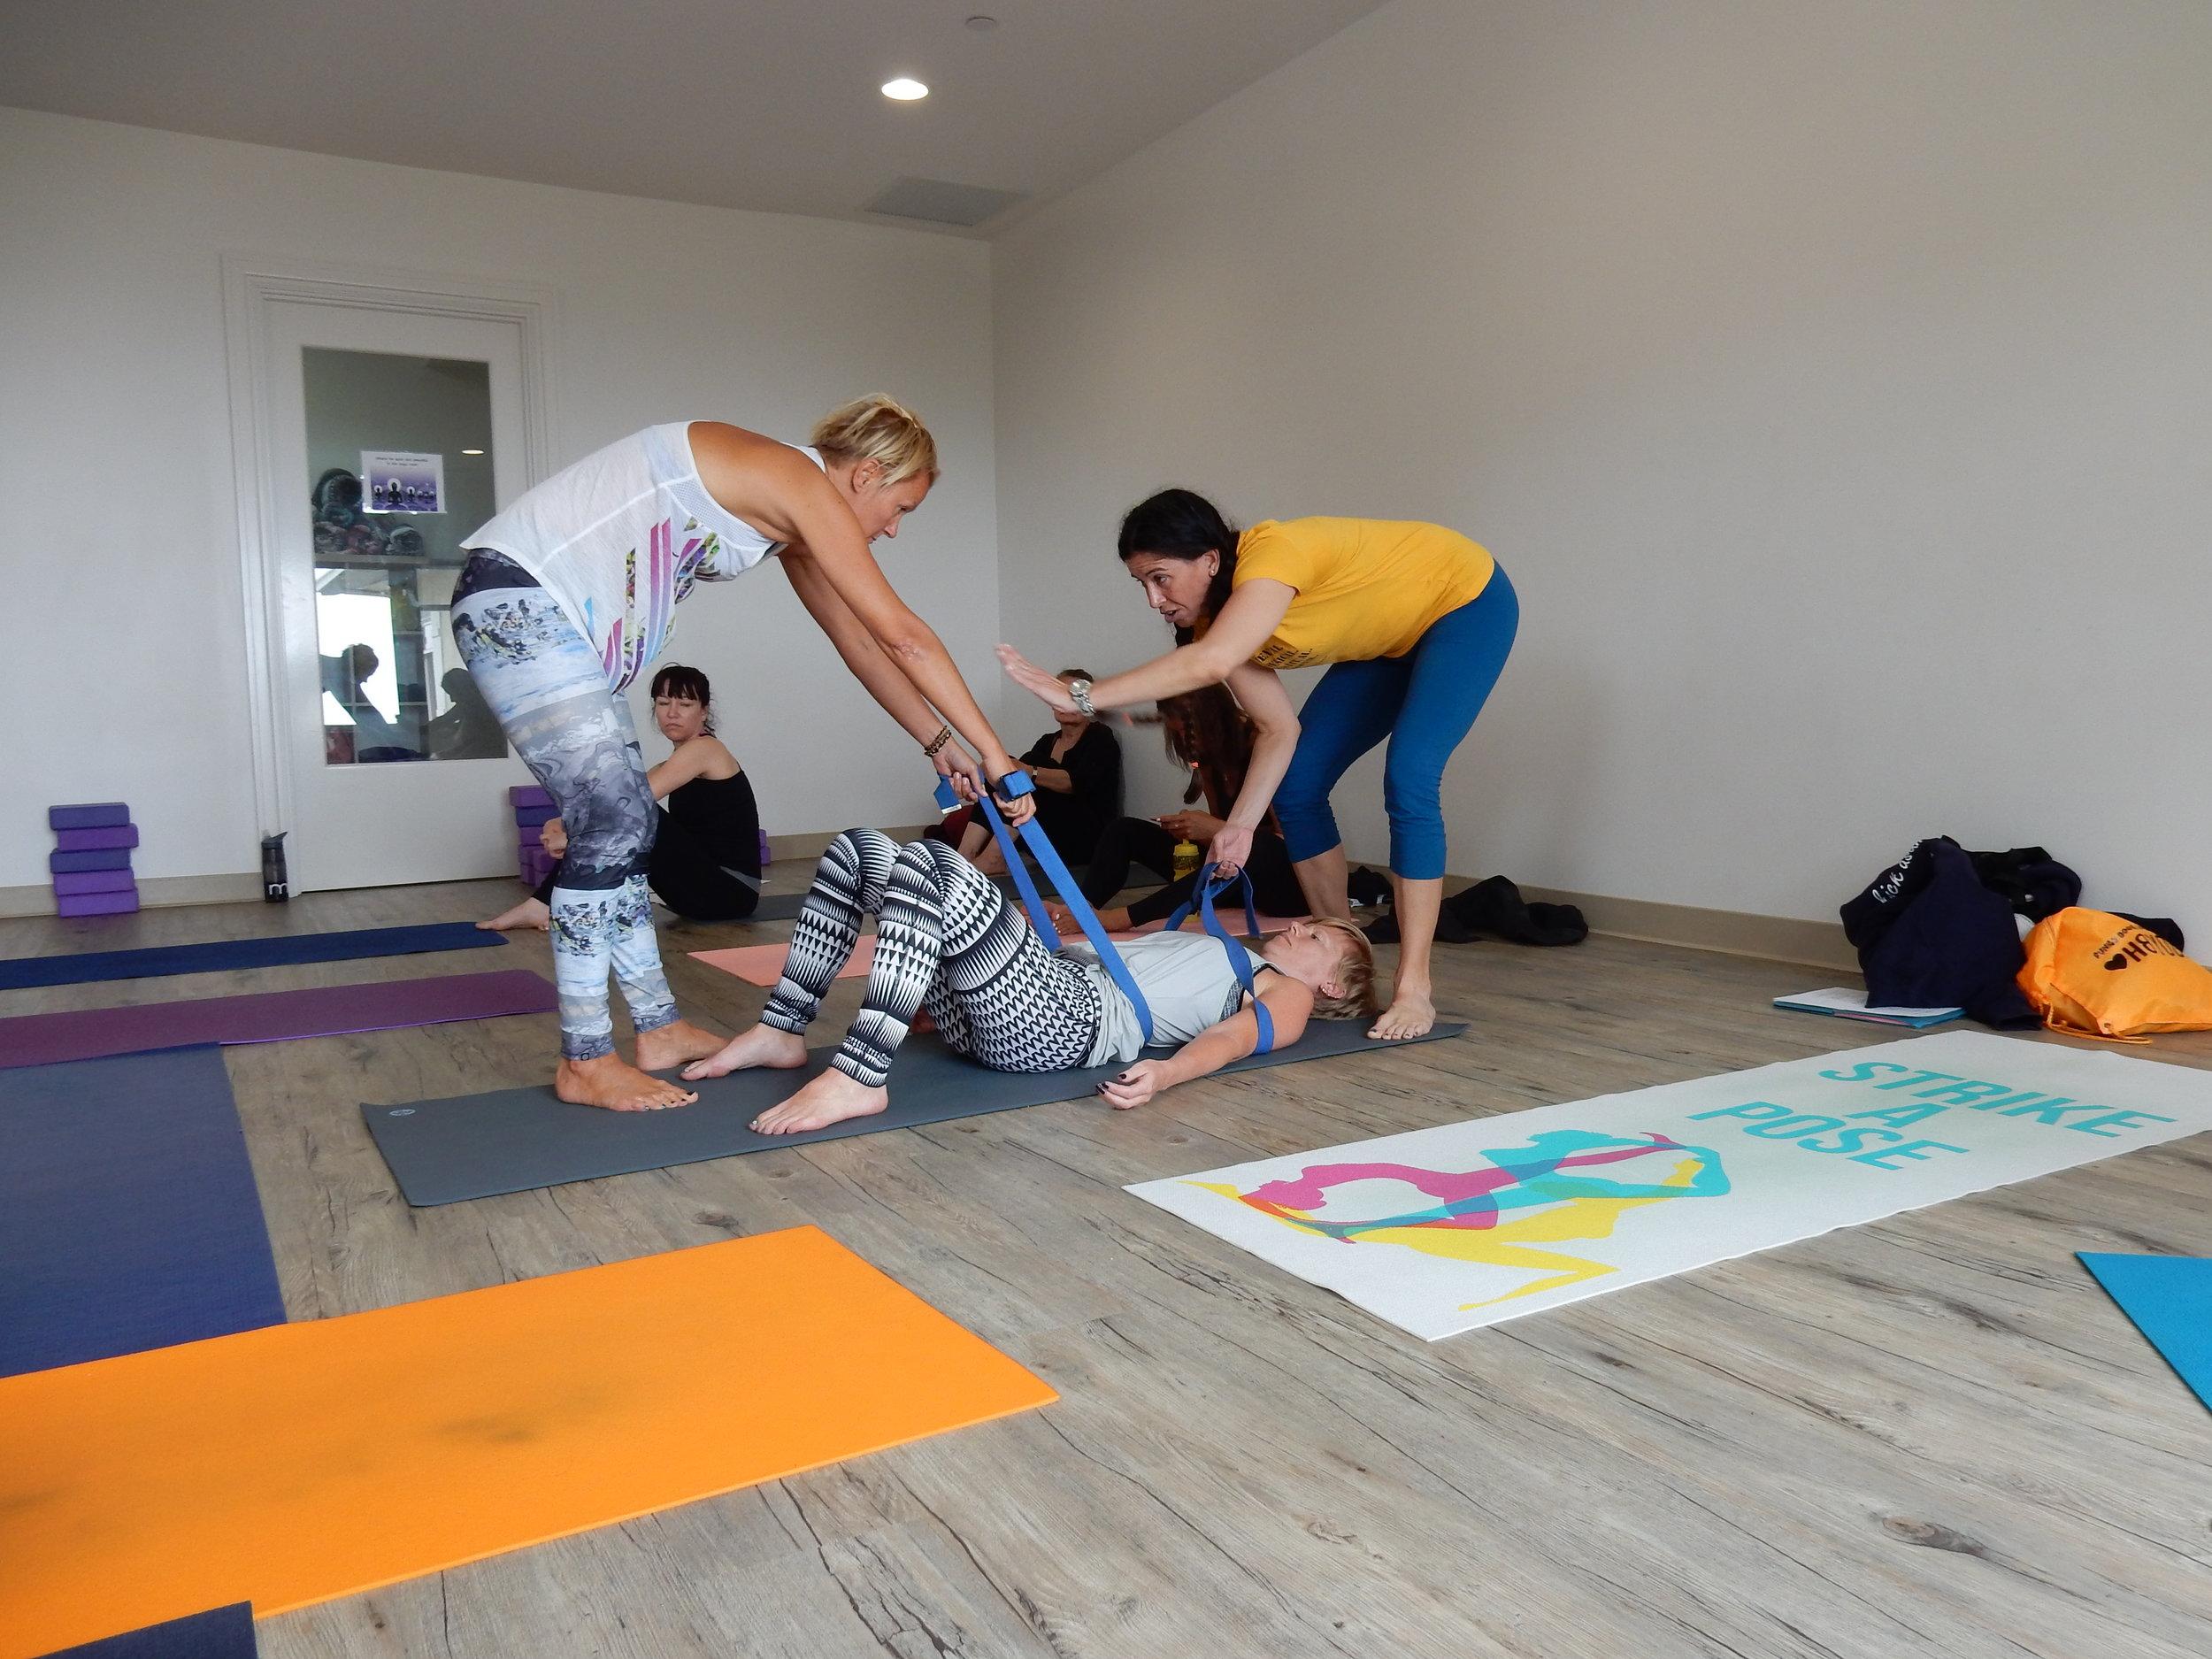 flow-yoga-teacher-training-santa-barbara-studio.JPG